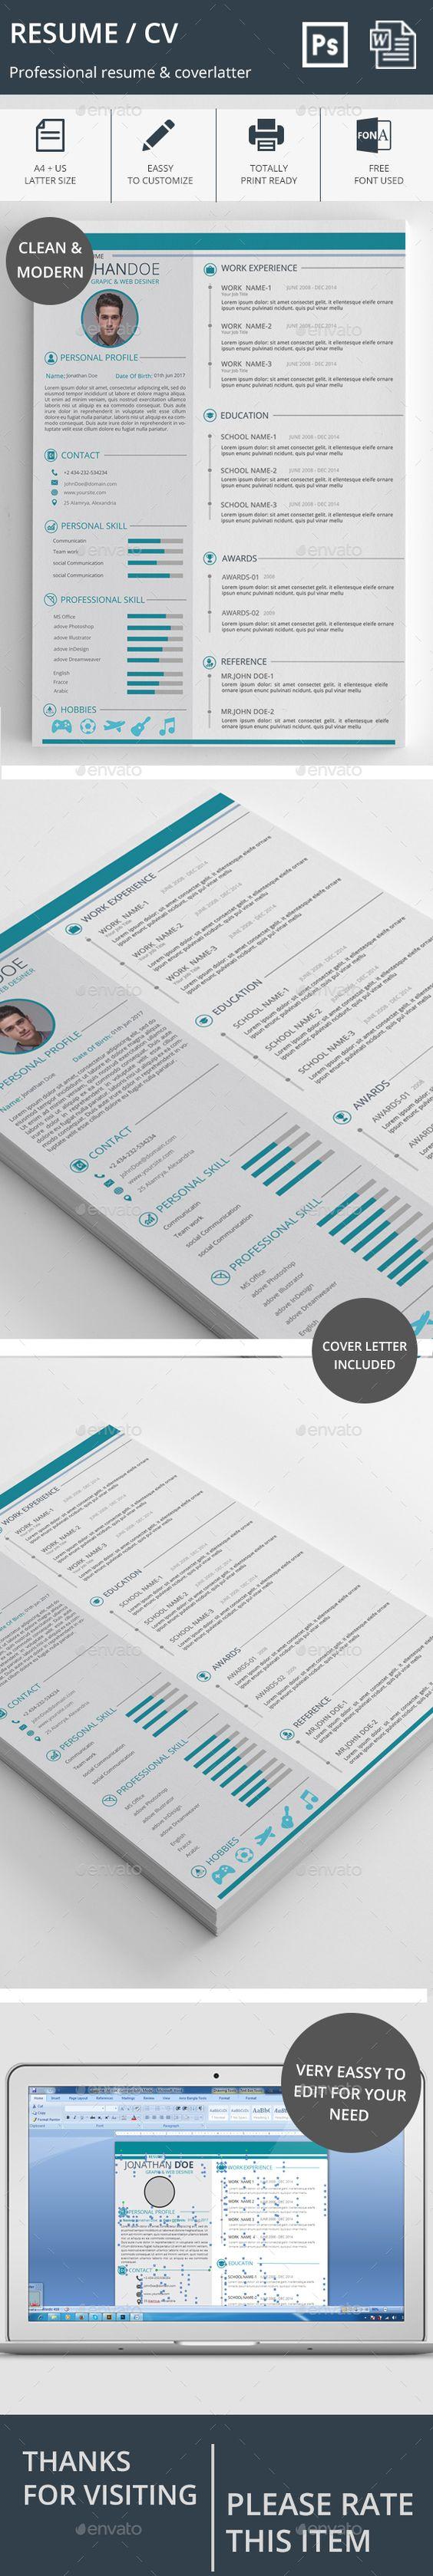 resume cv cv template resume and templates resume cv template psd ms word docx